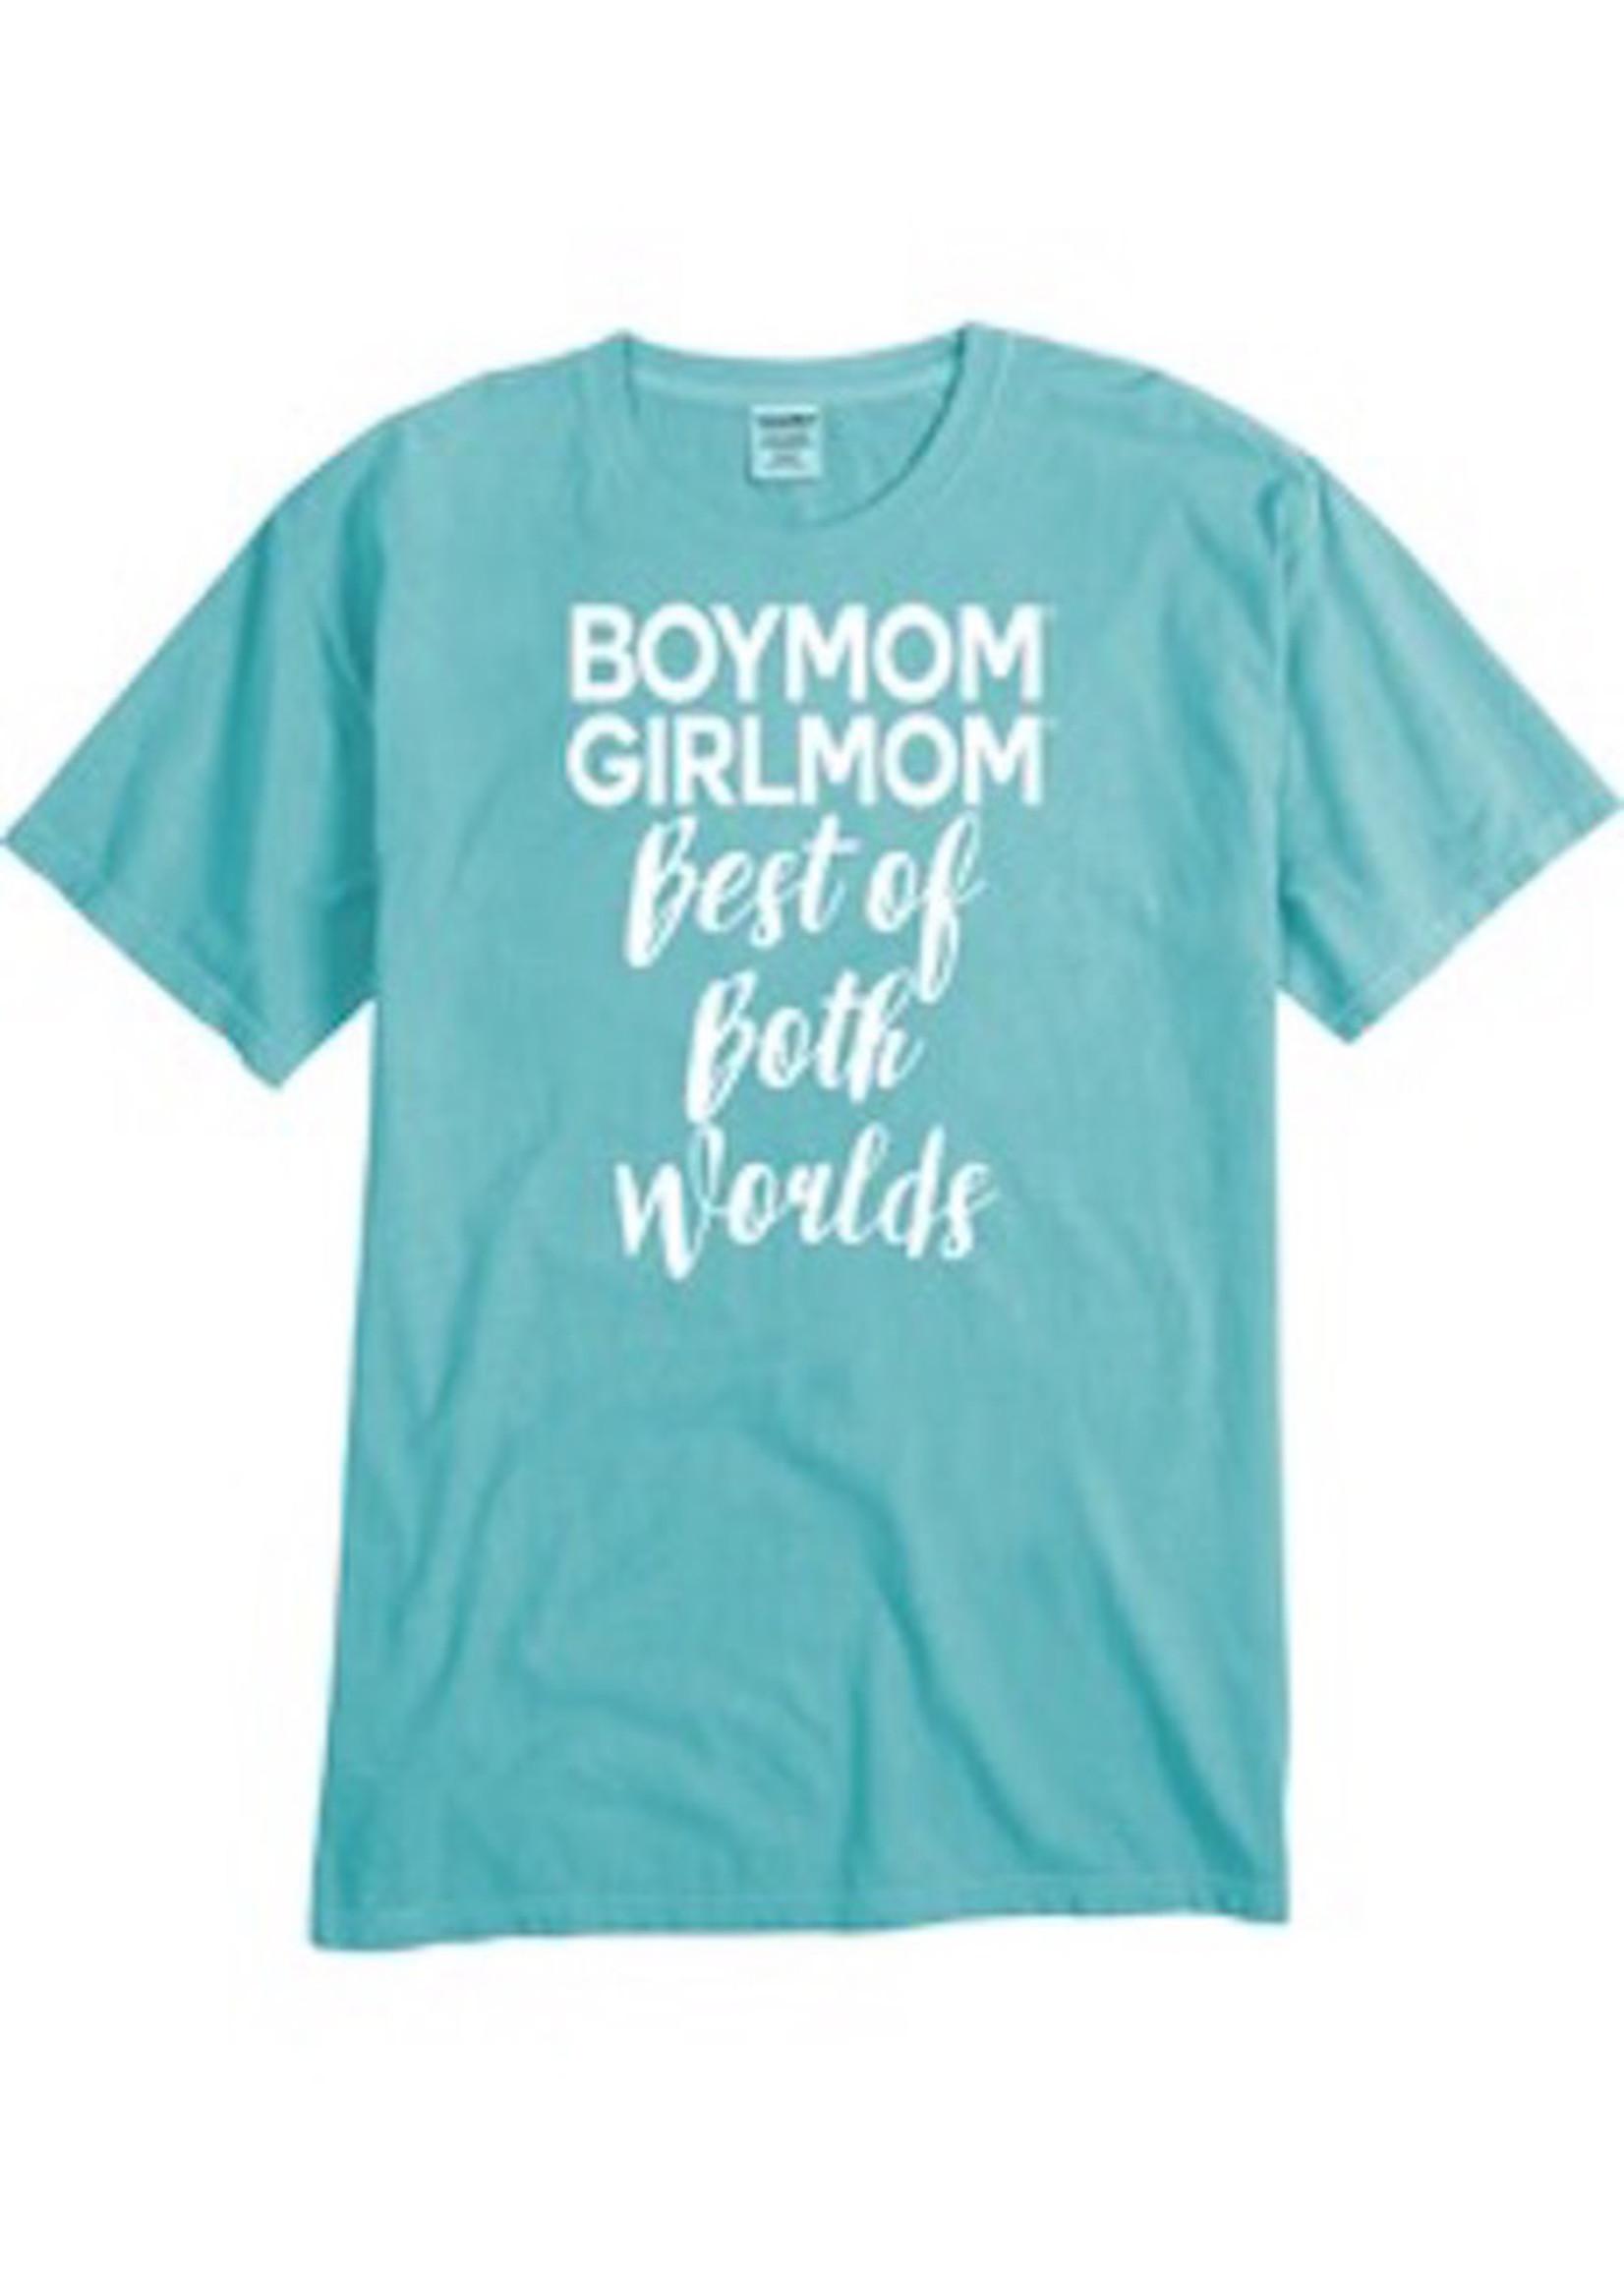 Boymom Best of Both T-Shirt